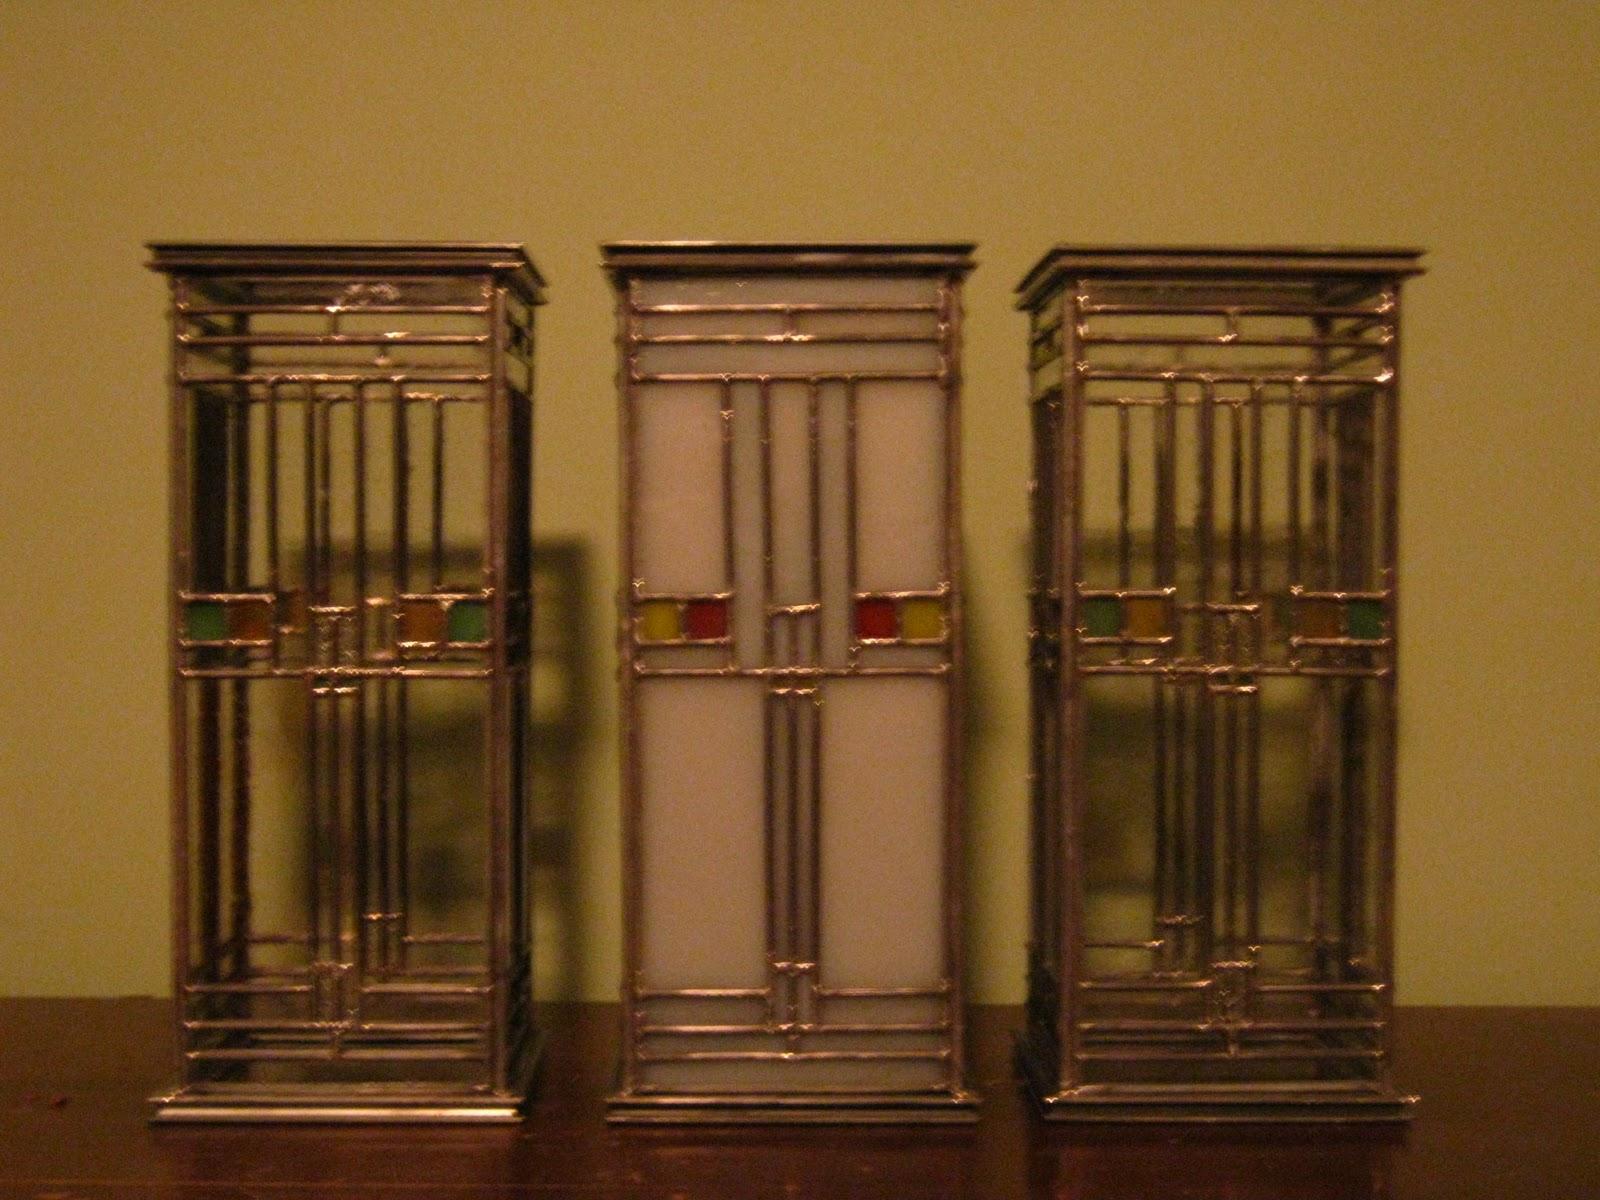 Nik Gl Art Finished Frank Lloyd Wright Candle Holders